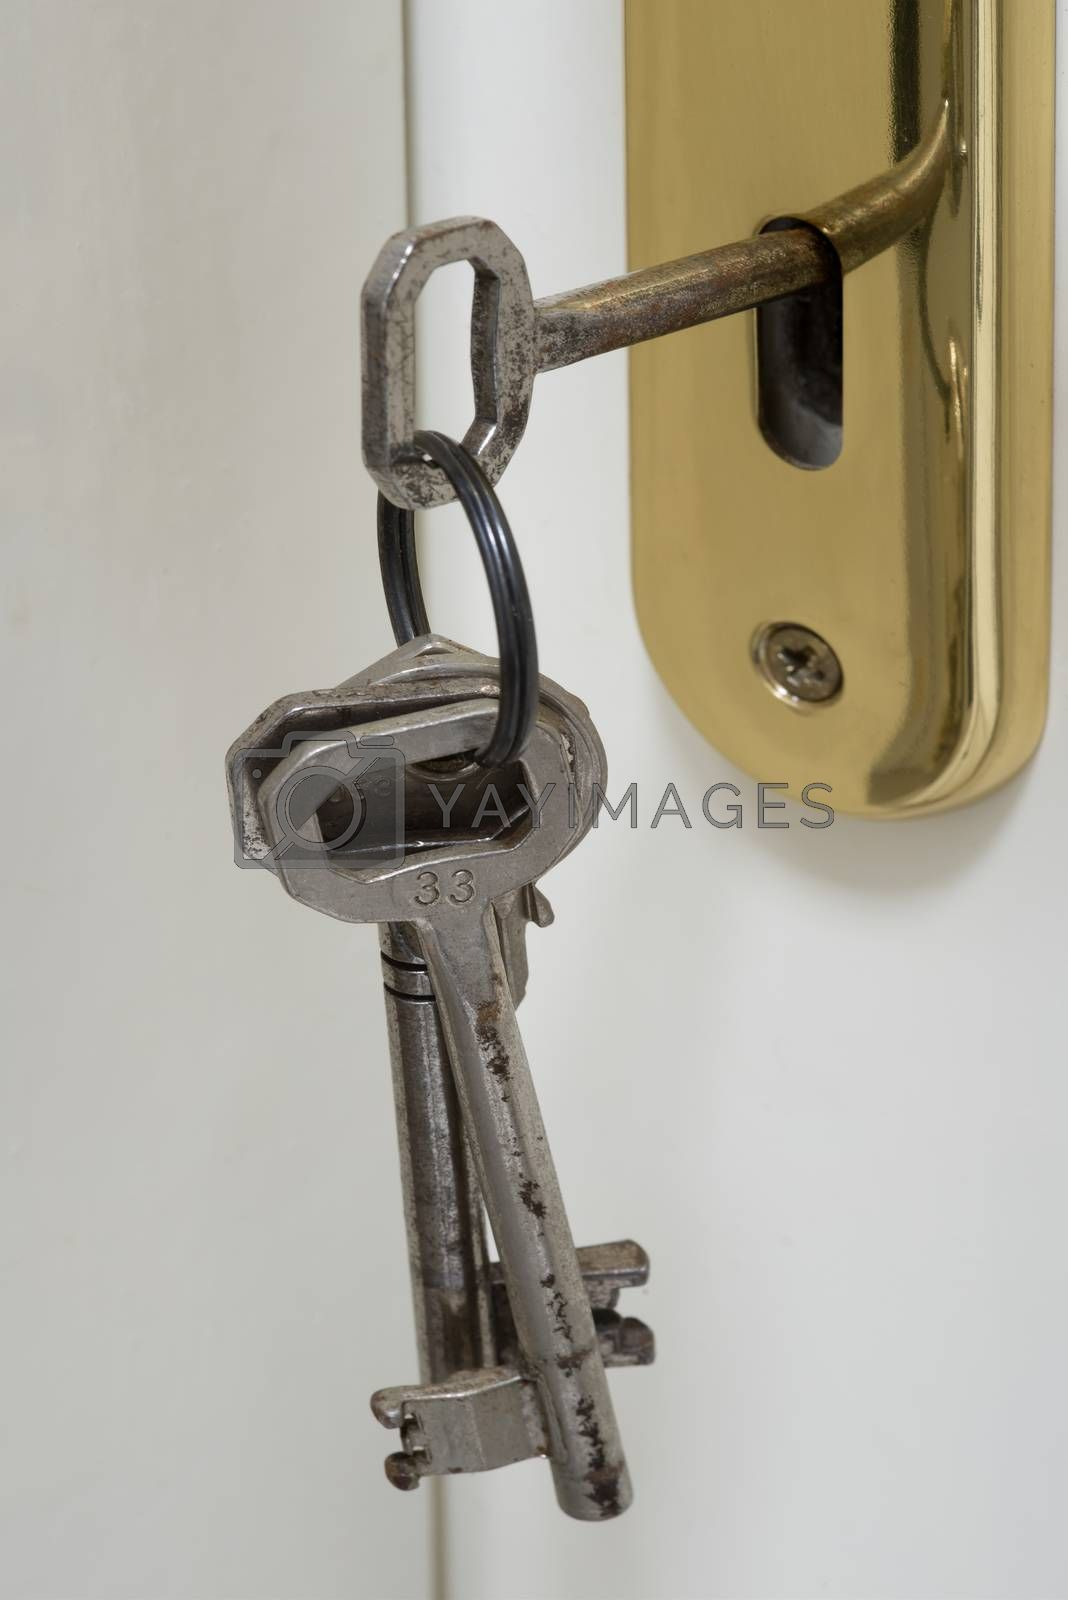 A key by sergiodv